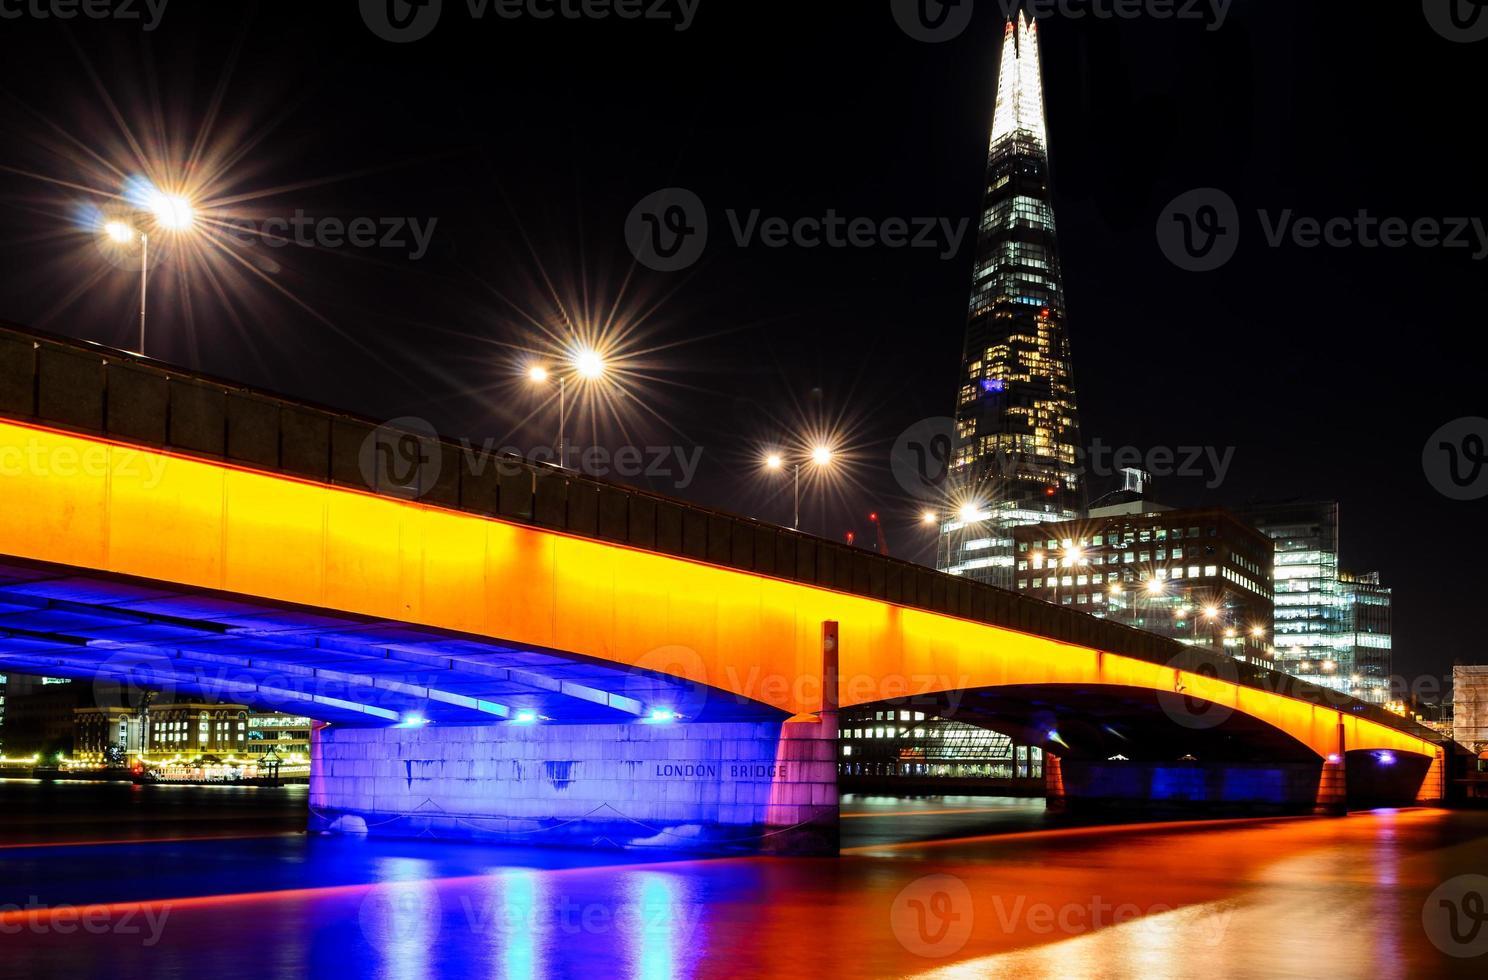 London, London Bridge at night photo